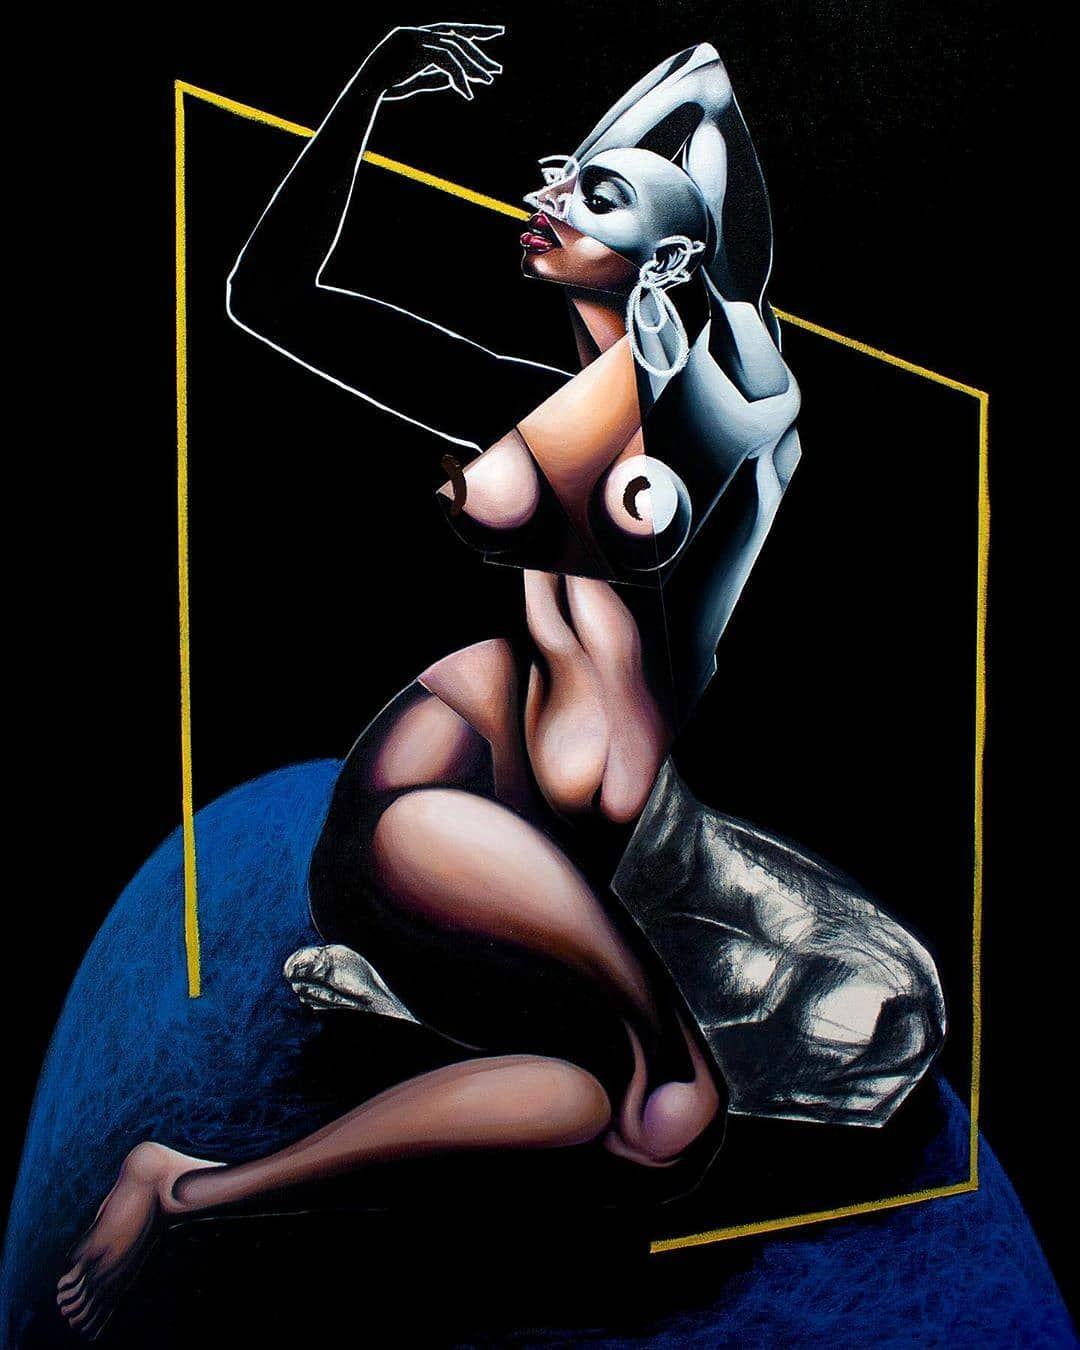 "🎨 #Dopeblackart by @malik.roberts.art ""Untitled Blue Rug"" 2020 By:Malik Roberts Acrylic, Oil , Charcoal, Oil Pastel 36in x 48in #photography #art #blackart #artoftheday#artfeature #artdaily #igart#digitaldrawing #realisticdrawing #pencildrawing #artspotlight #igartist #drawing #coolart #dopeart #blackartwork #artgallery #supportblackart #blackartist #coolartwork #artfido#artlife #artwork #dopeblackartist #dopeblackart #Artistatwork #dopeartistatwork For art subs or any business >>dopebla"